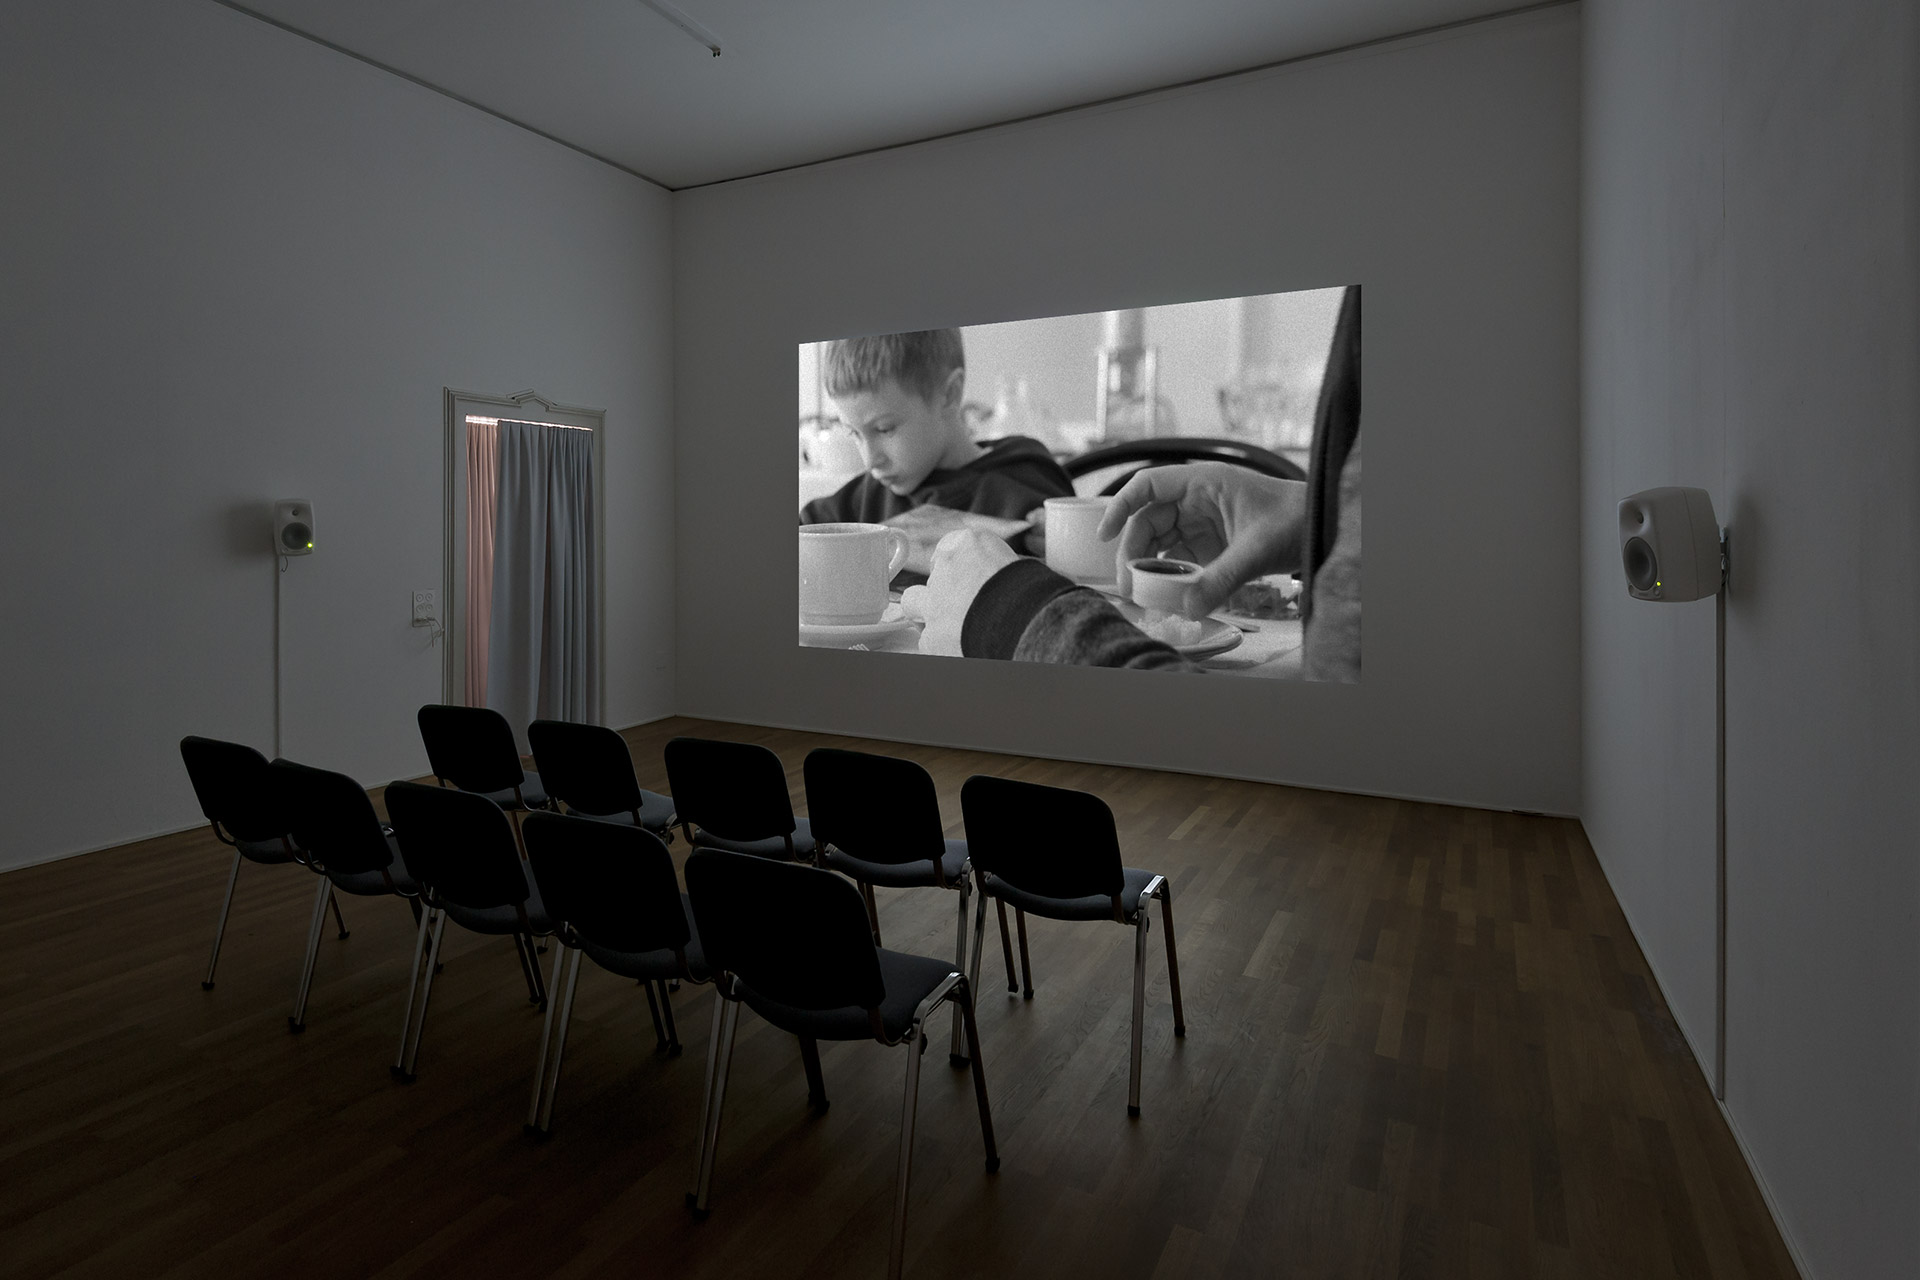 Kunsthalle-Winterthur-Josef-Dabernig-1.jpg